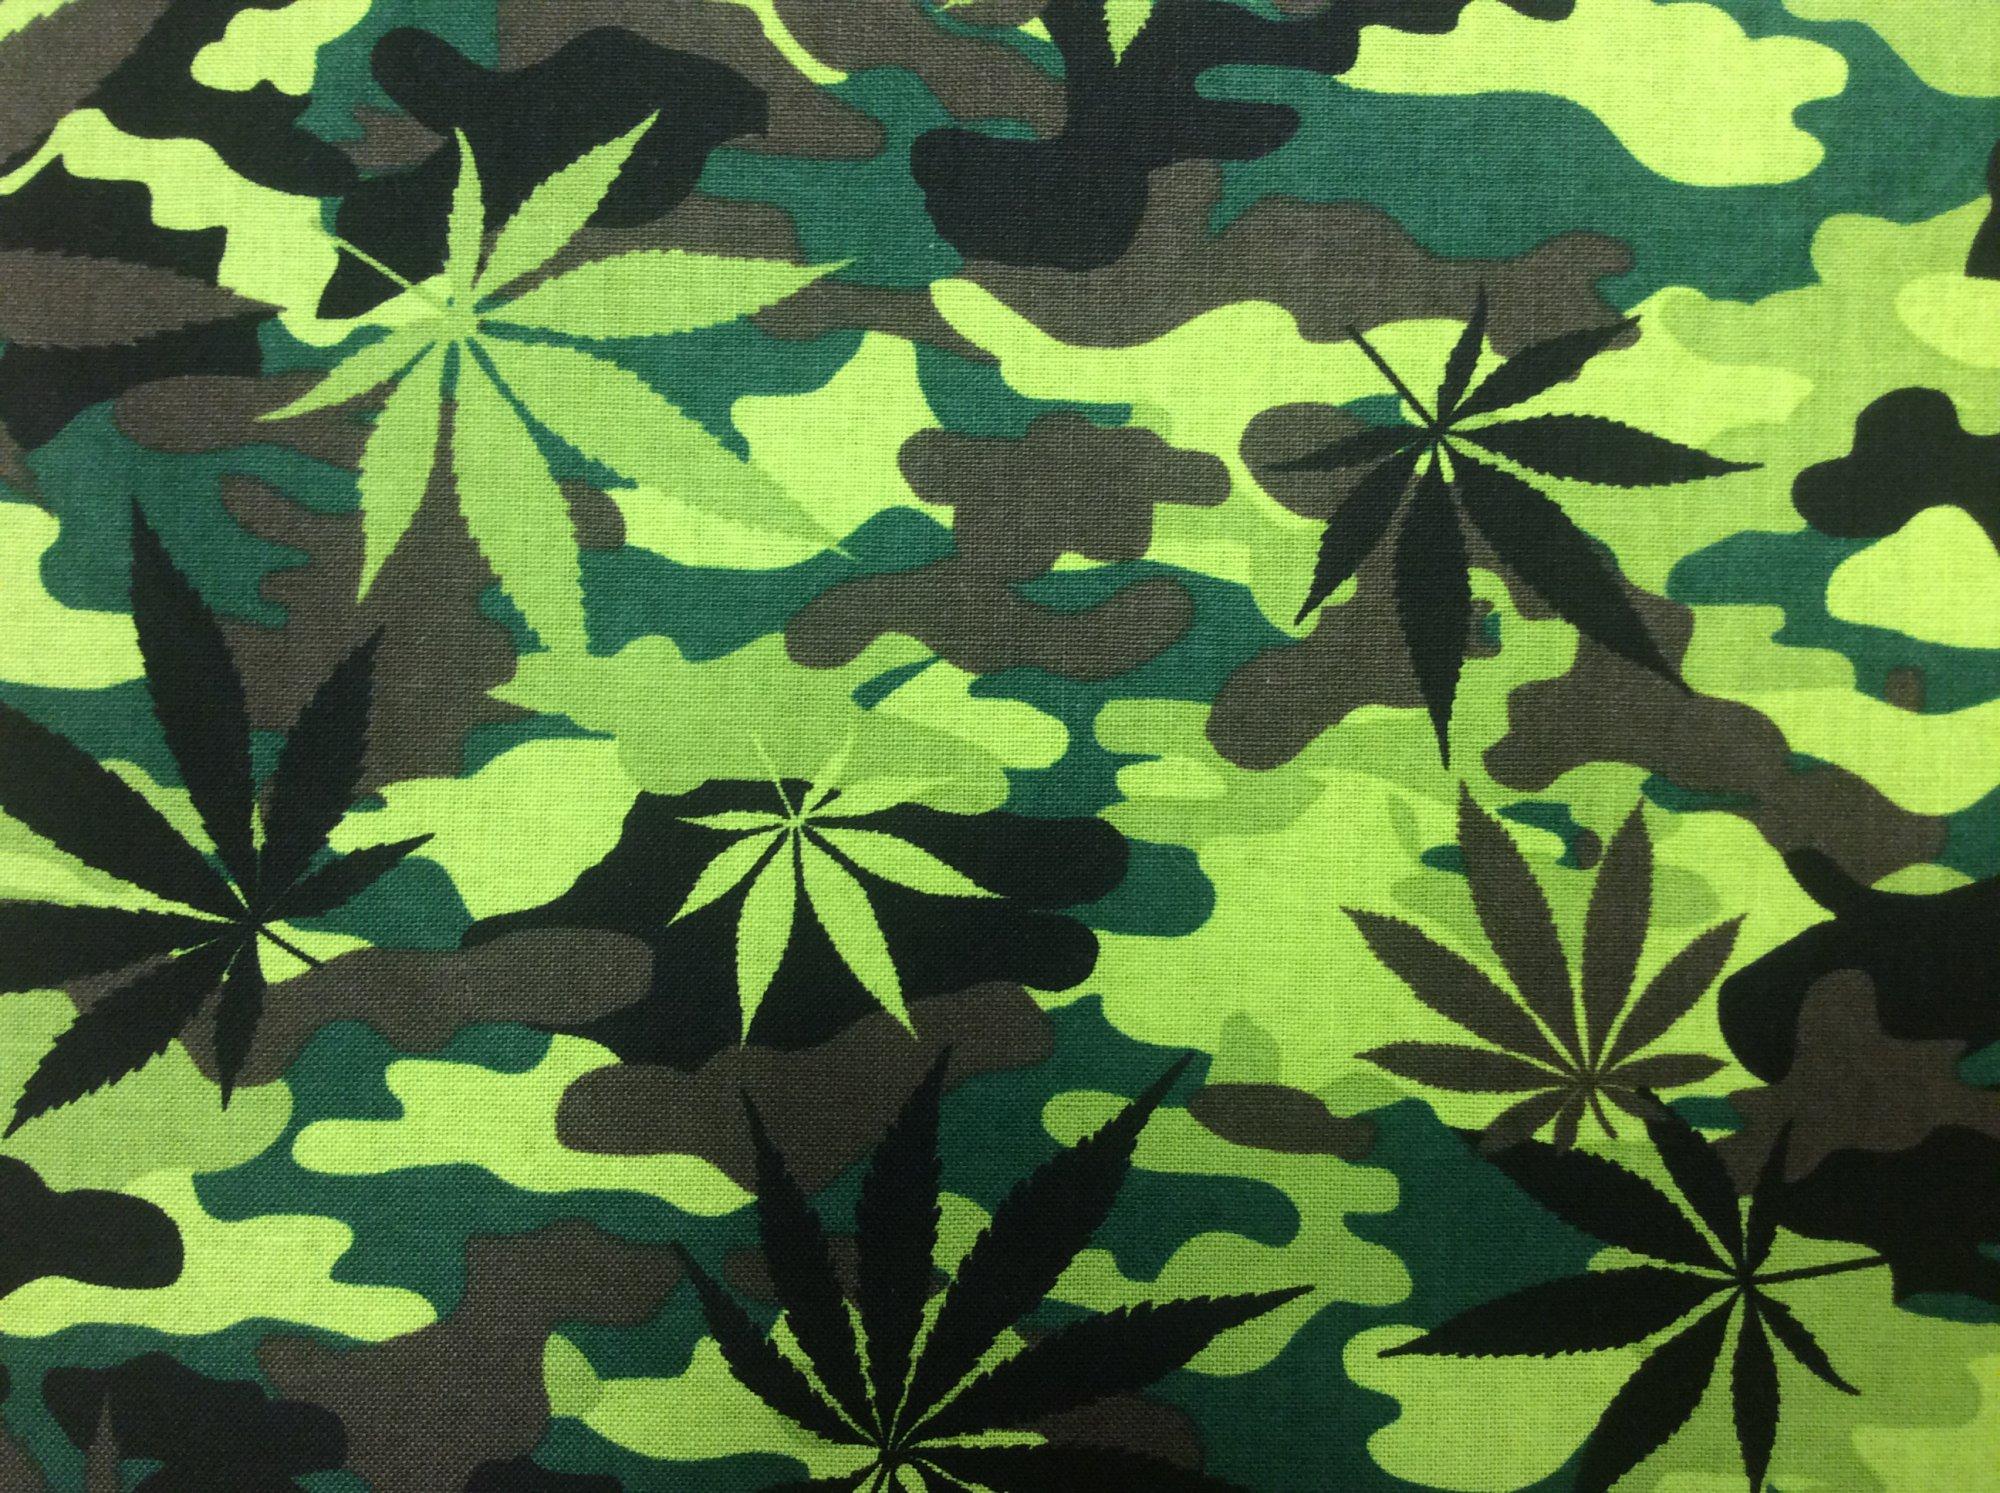 Marijuana Camo Pot Leaves Cotton Quilt Fabric TT117